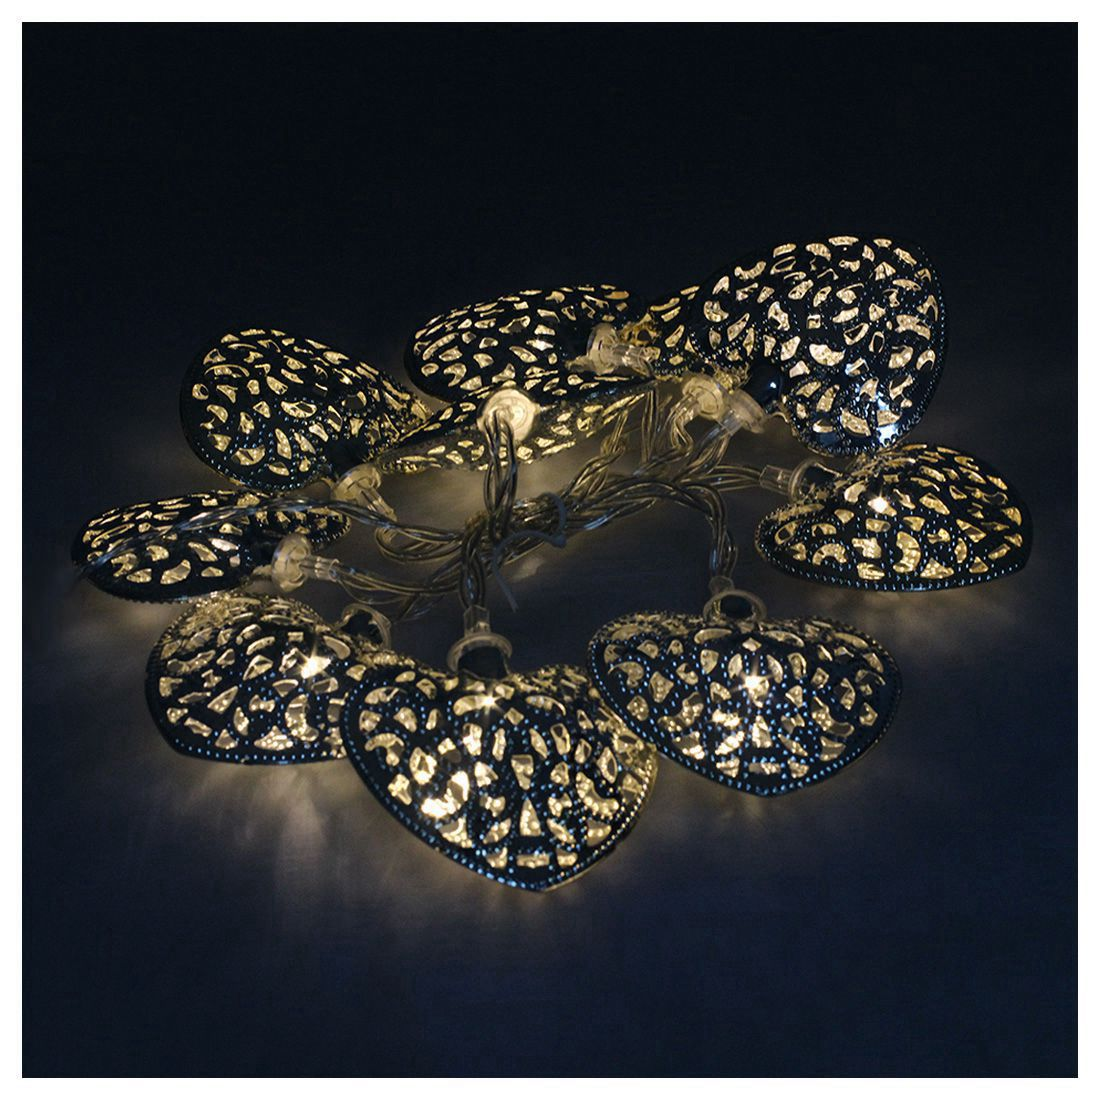 10 LED Filigree Metal Heart Battery Operated Bedroom ...